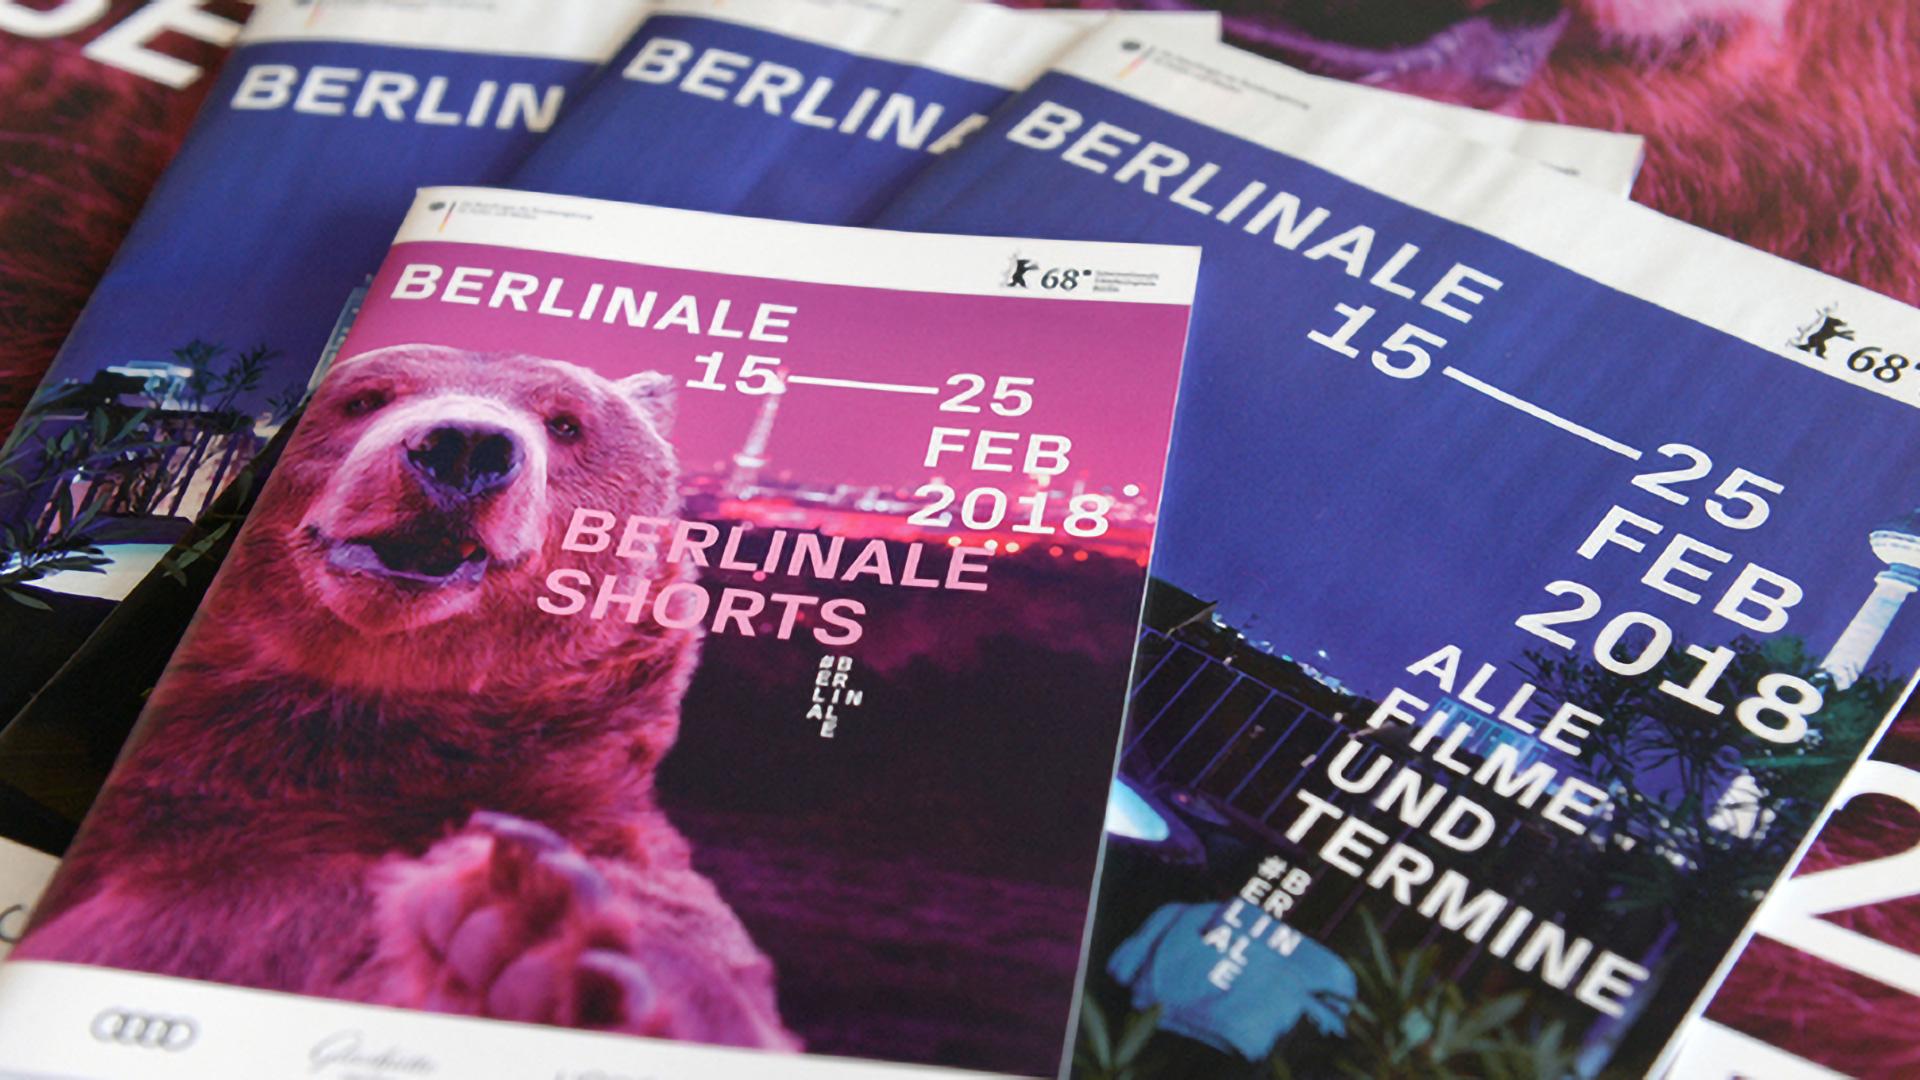 Berlinale_18_Programm